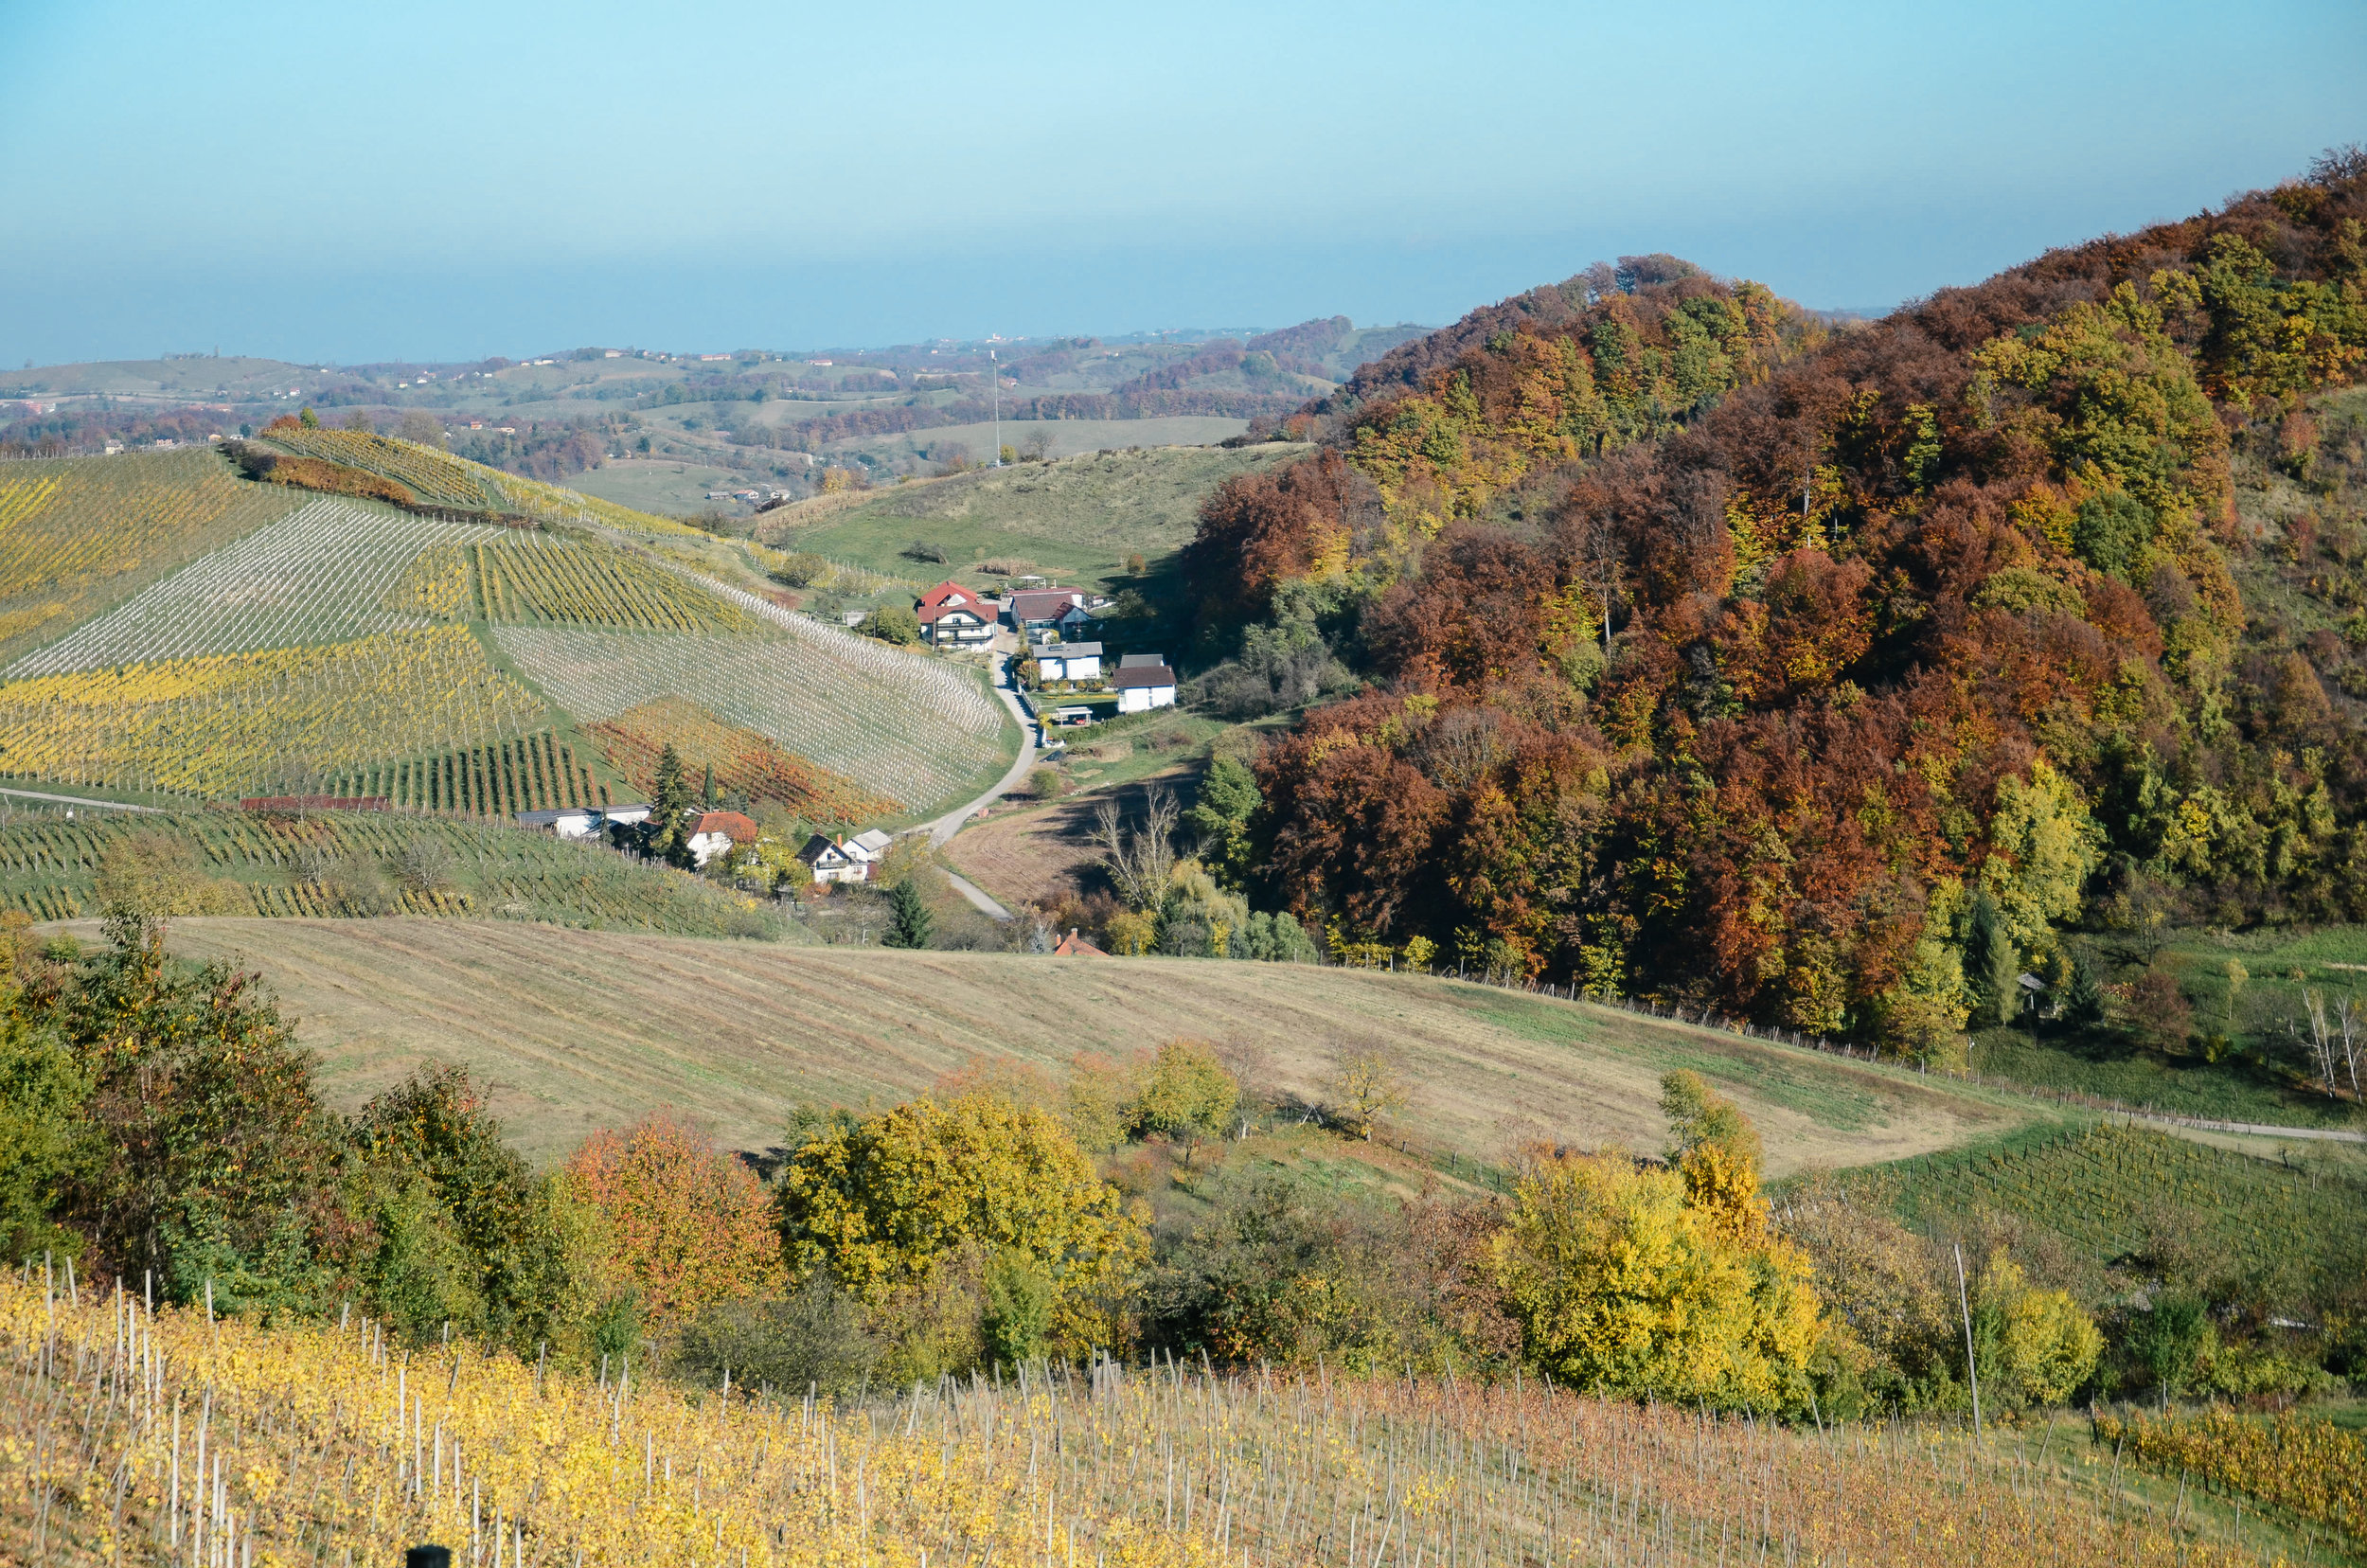 slovenia-travel-glamping-chateau-ramsak_DSC_2533.jpg